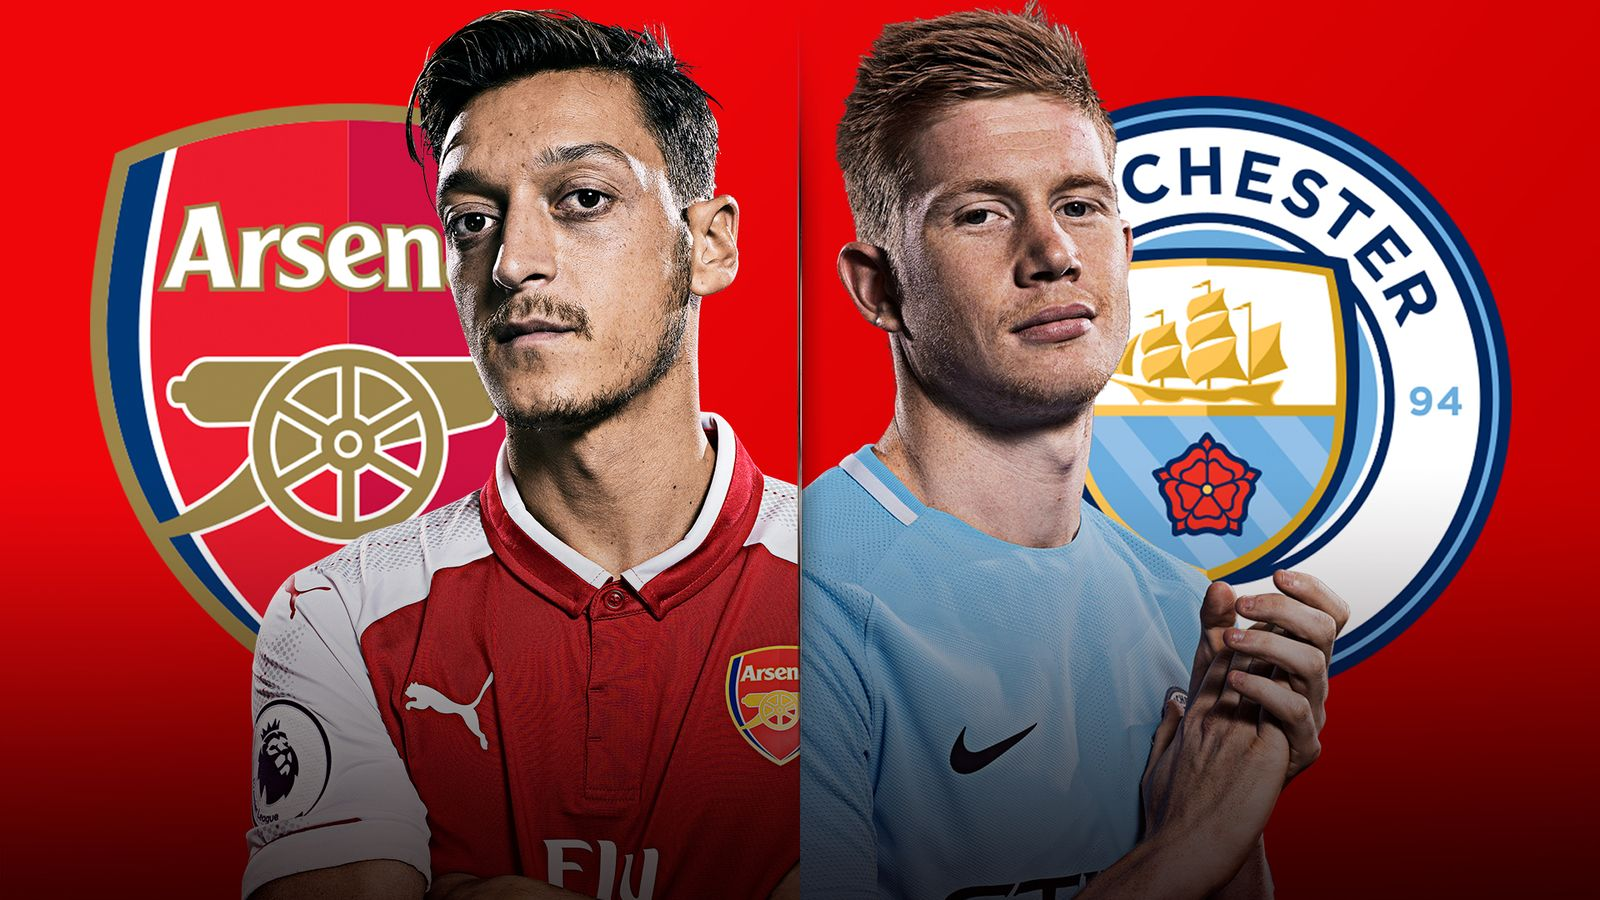 Carabao Cup Final On Sky Sports Arsenal V Man City